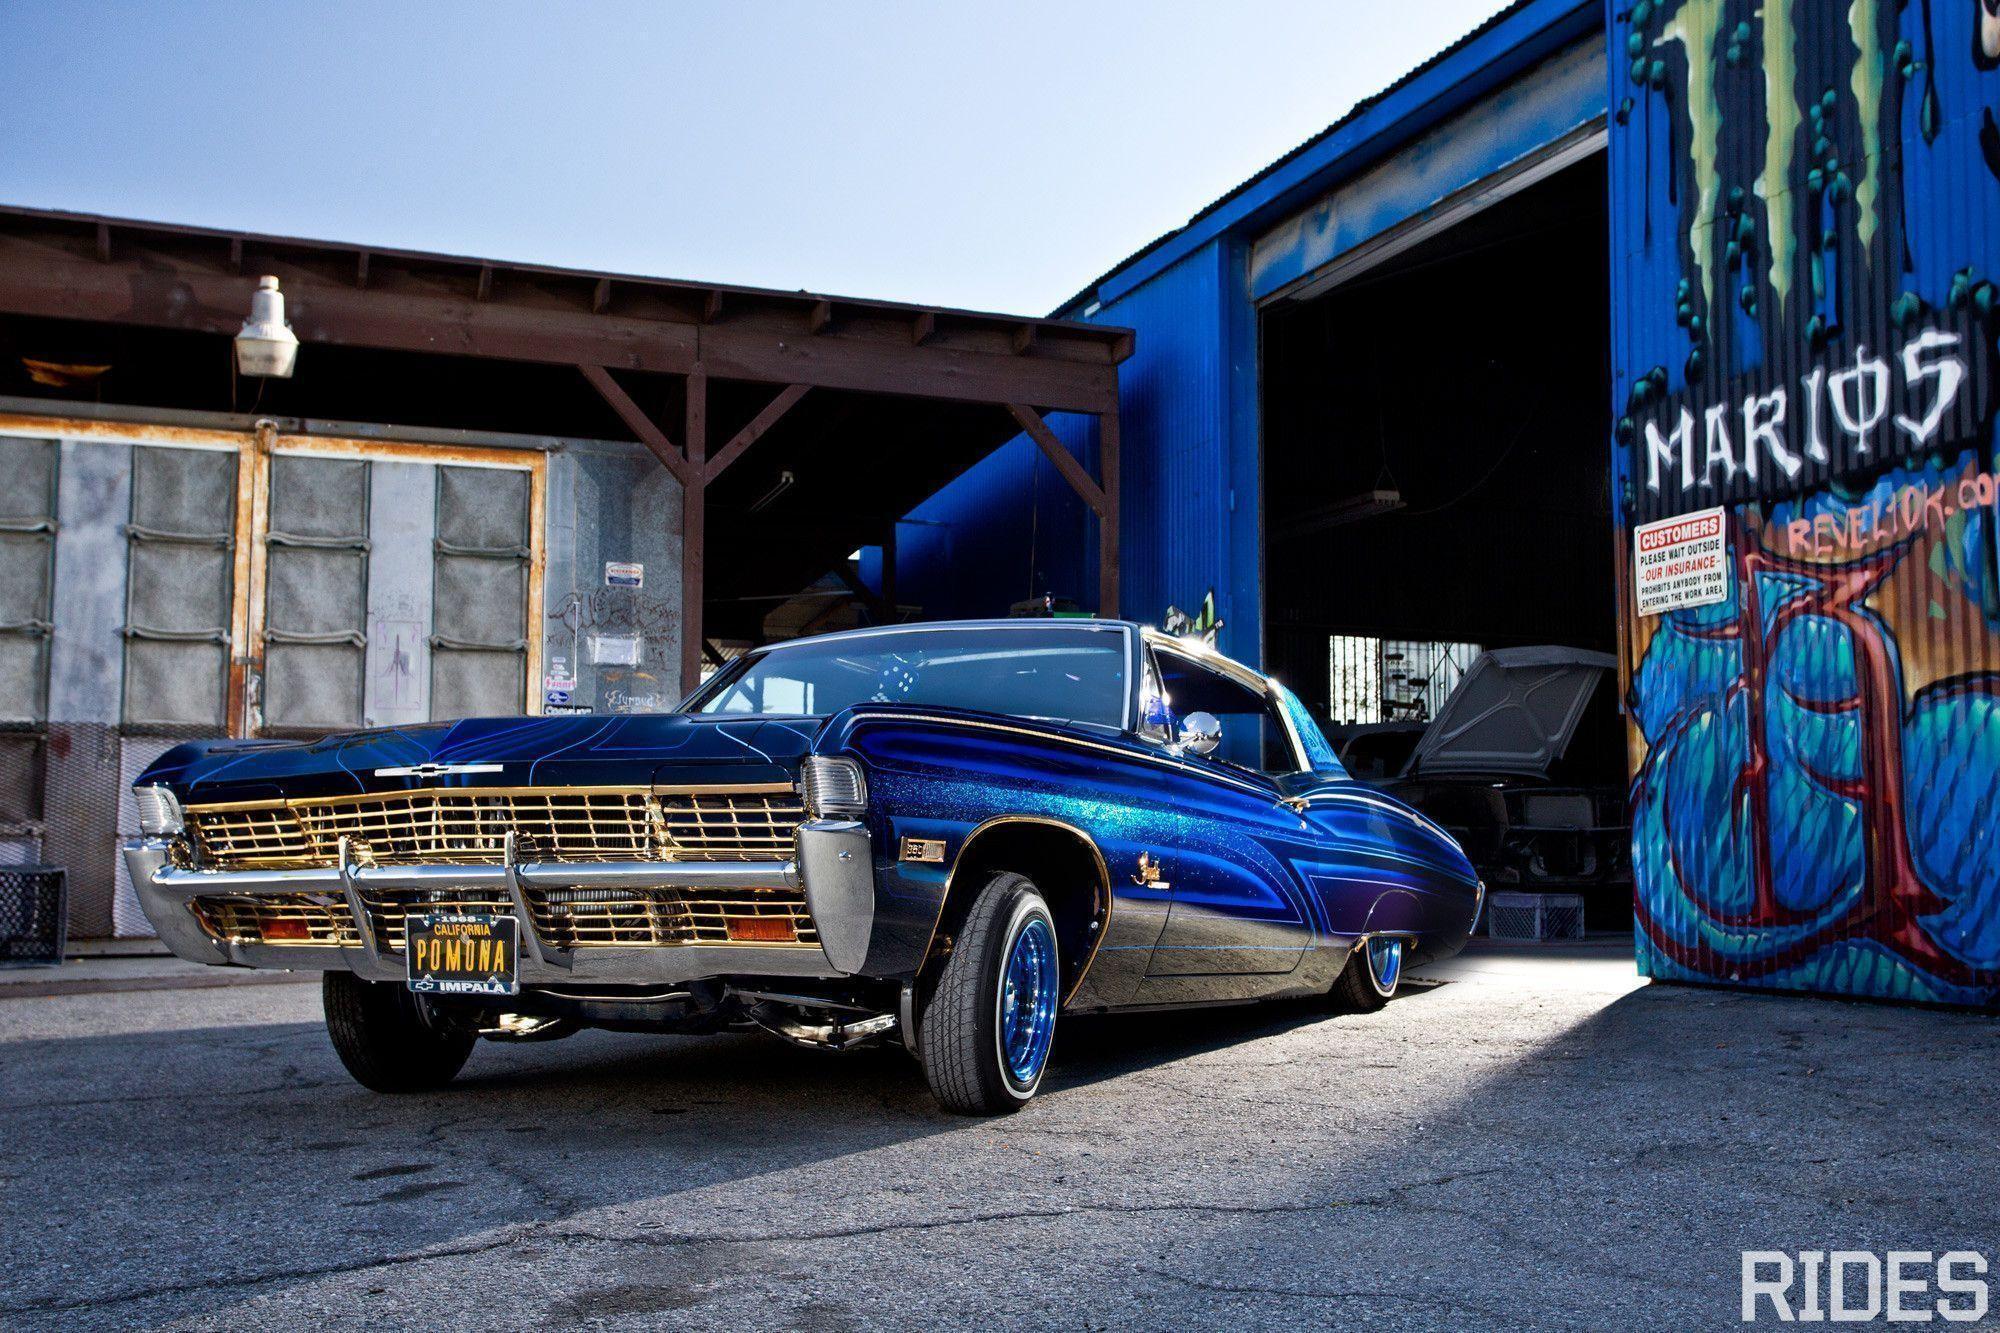 2000x1333 Impala Lowrider Wallpapers